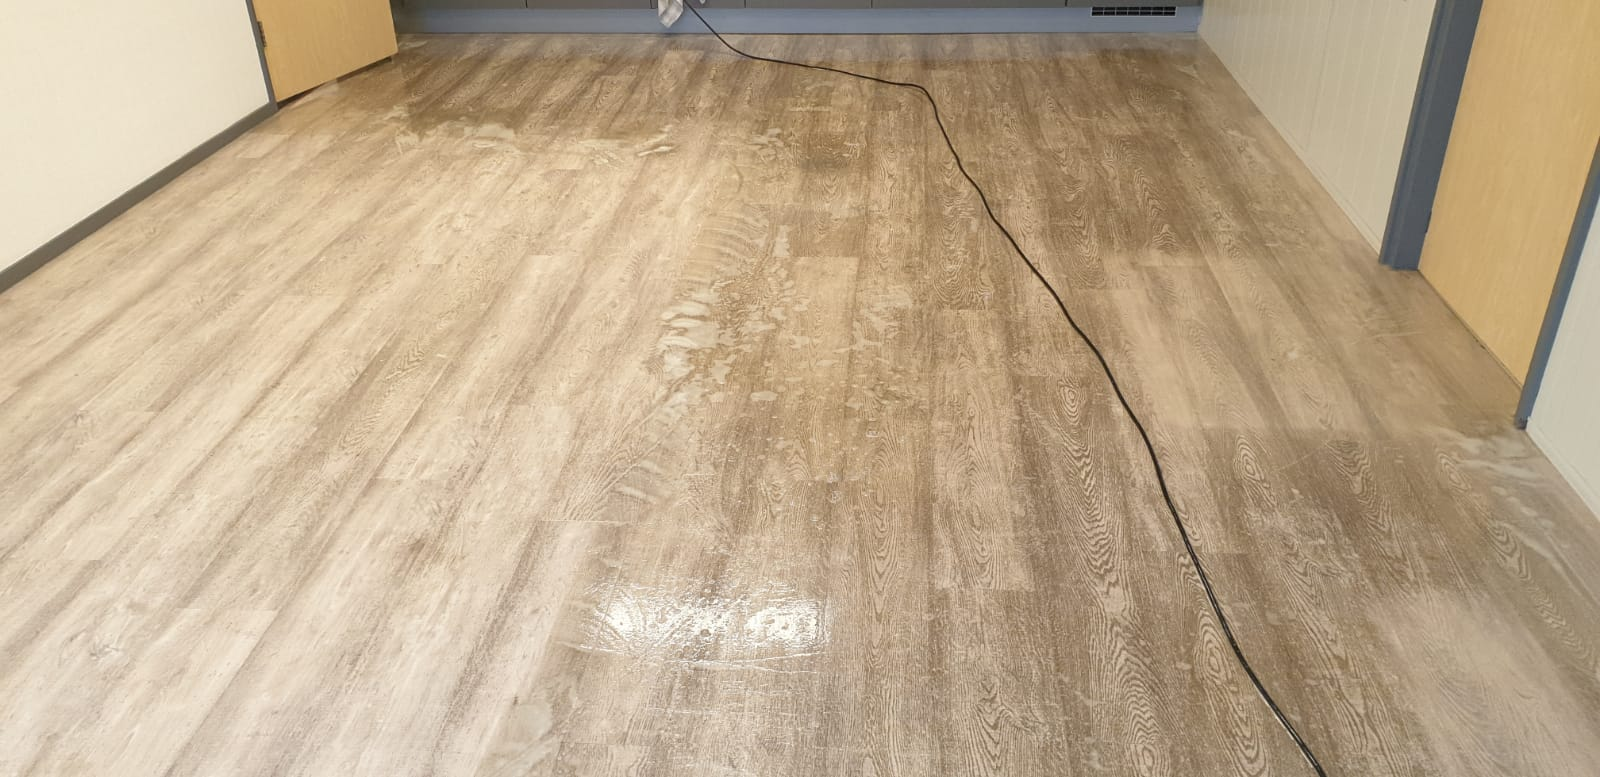 PVC Vloer laten behandelen en onderhouden